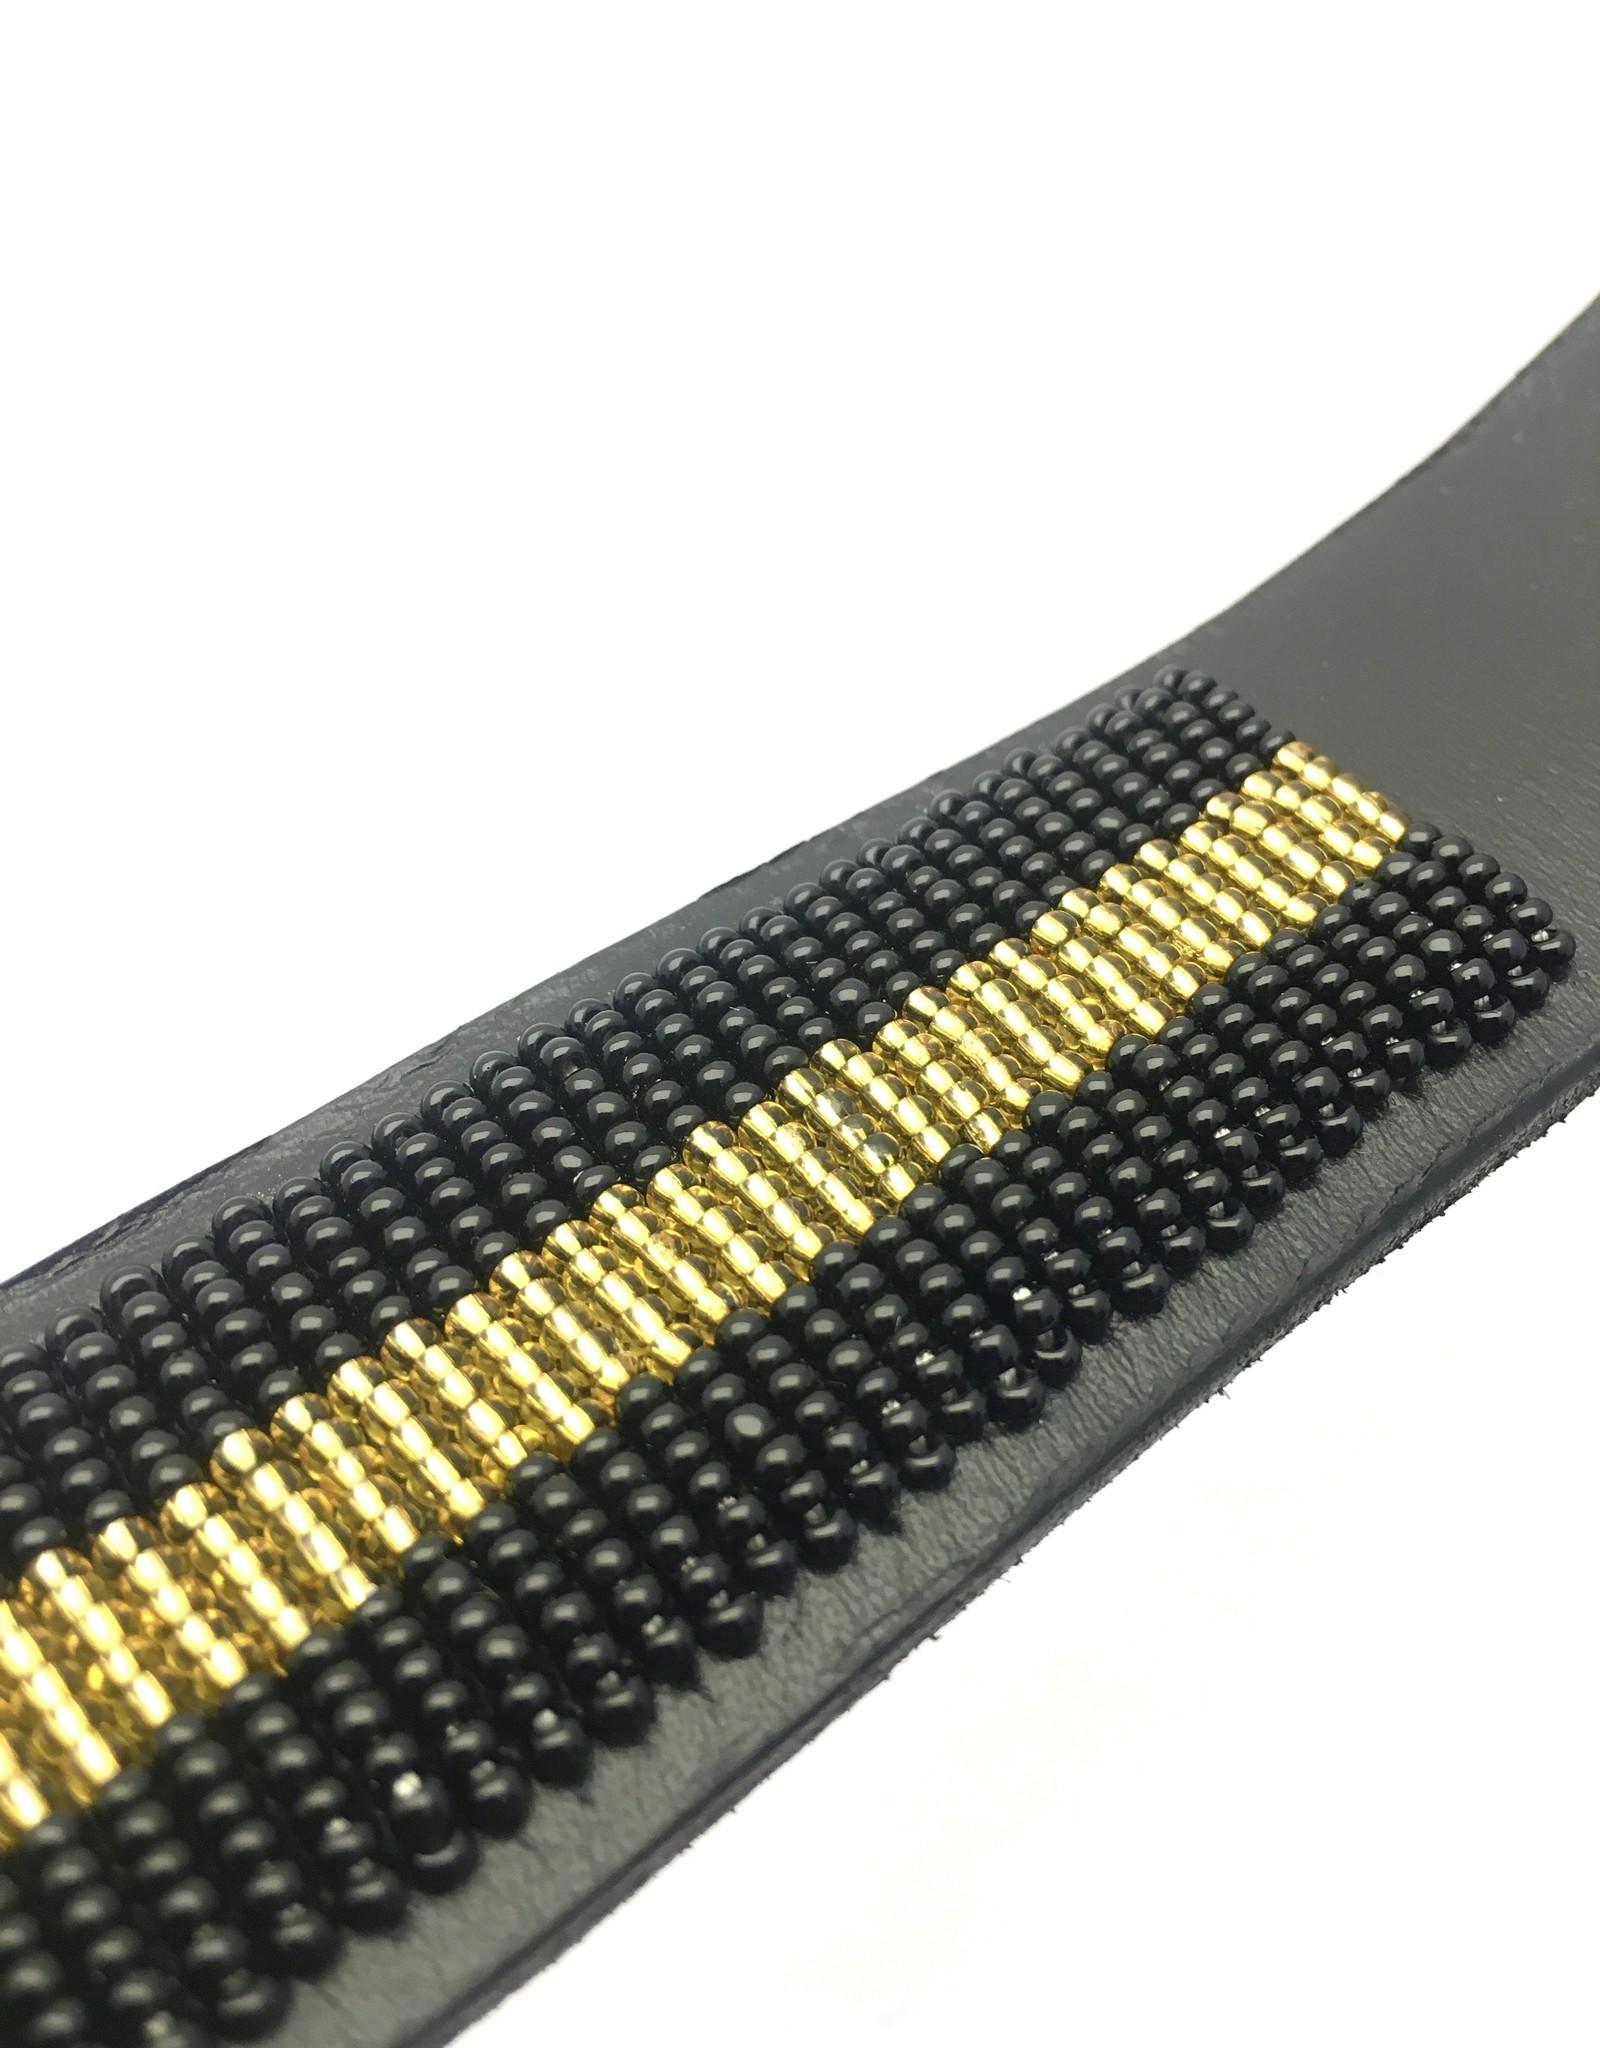 Maisha.Style Belt for Dhahabu - black leather Maasai belt with black and gold beads